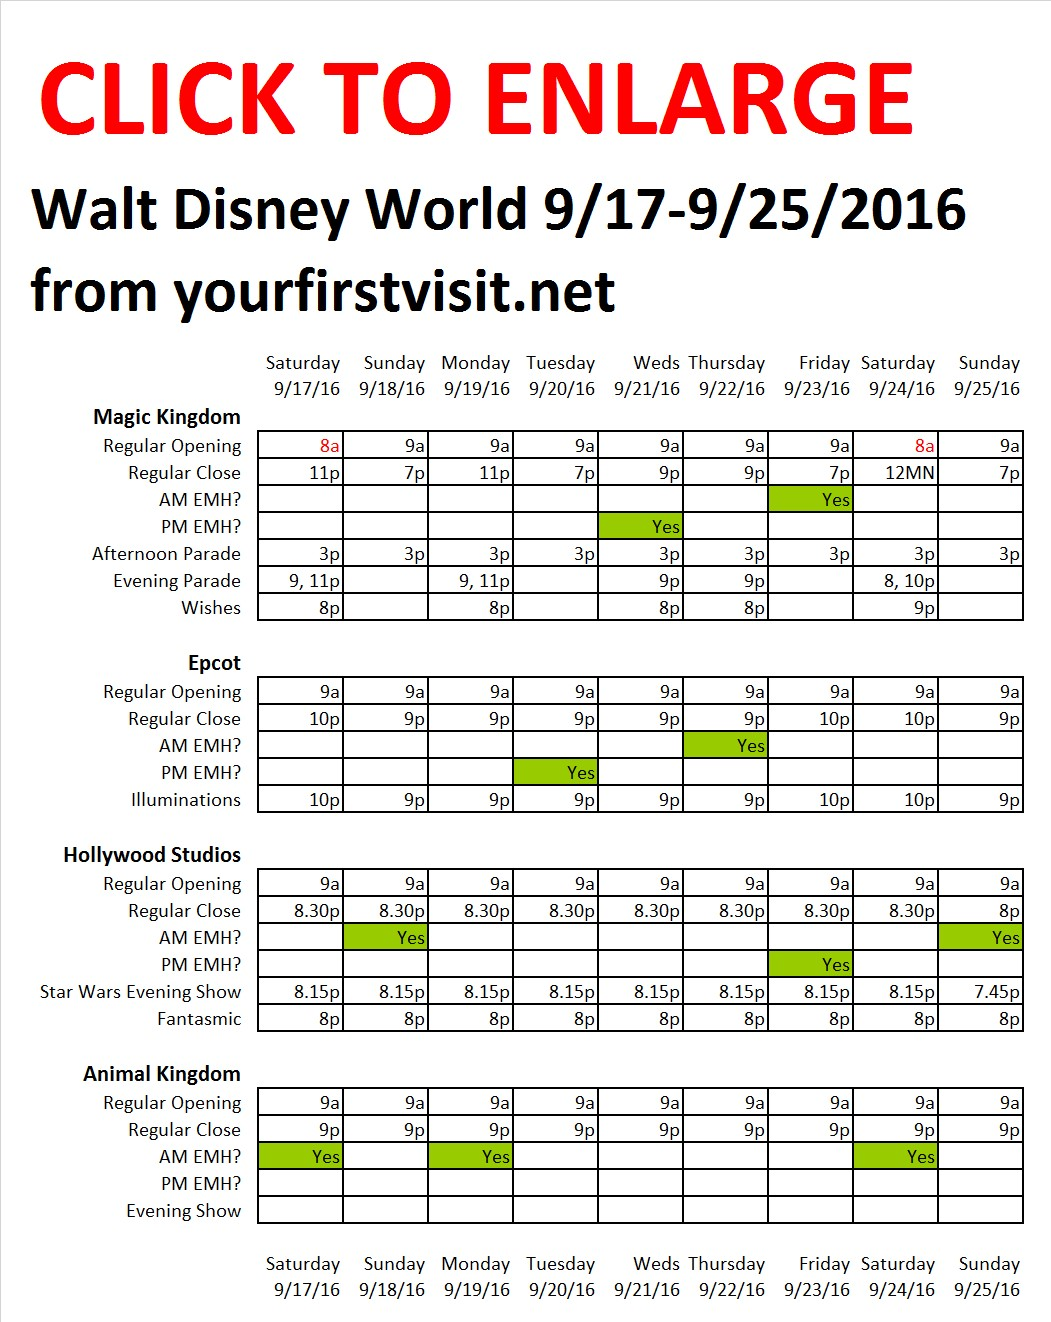 disney-world-9-17-to-9-25-2016-from-yourfirstvisit-net